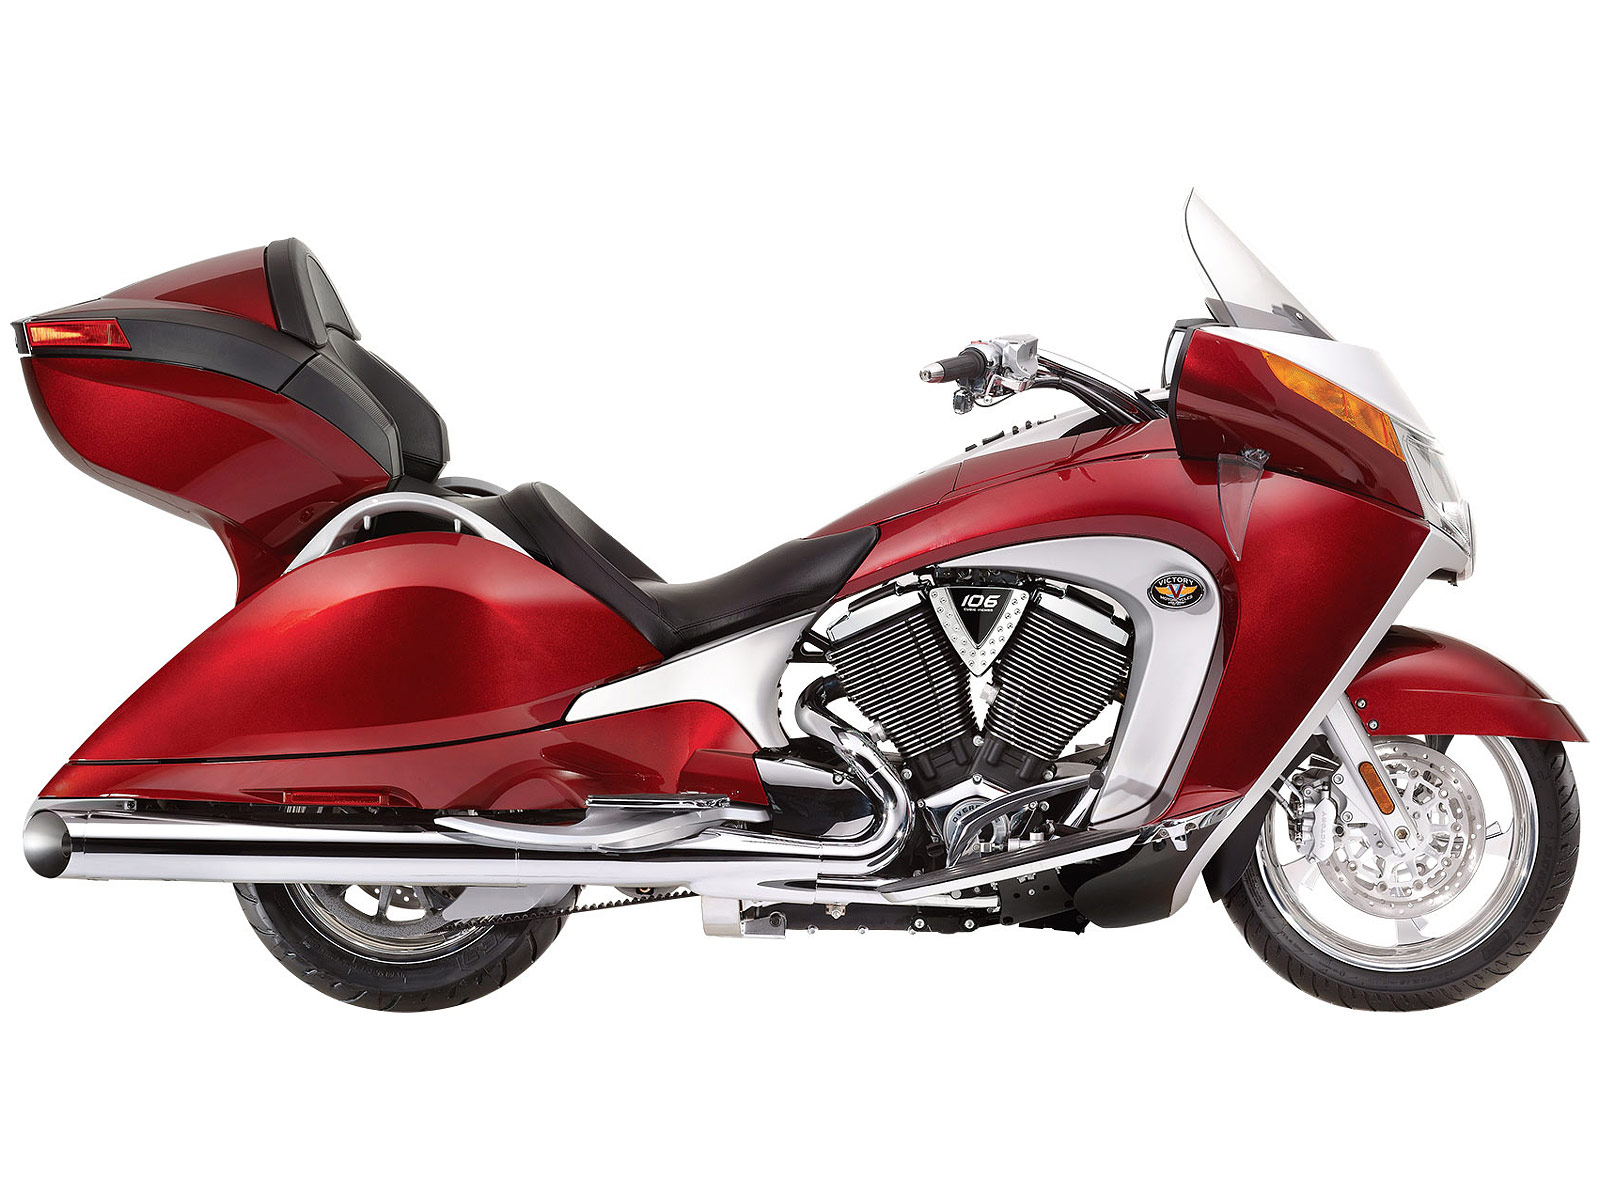 Victory Vision Tour 2010 motorcycle desktop wallpaper 4jpg 1600x1200